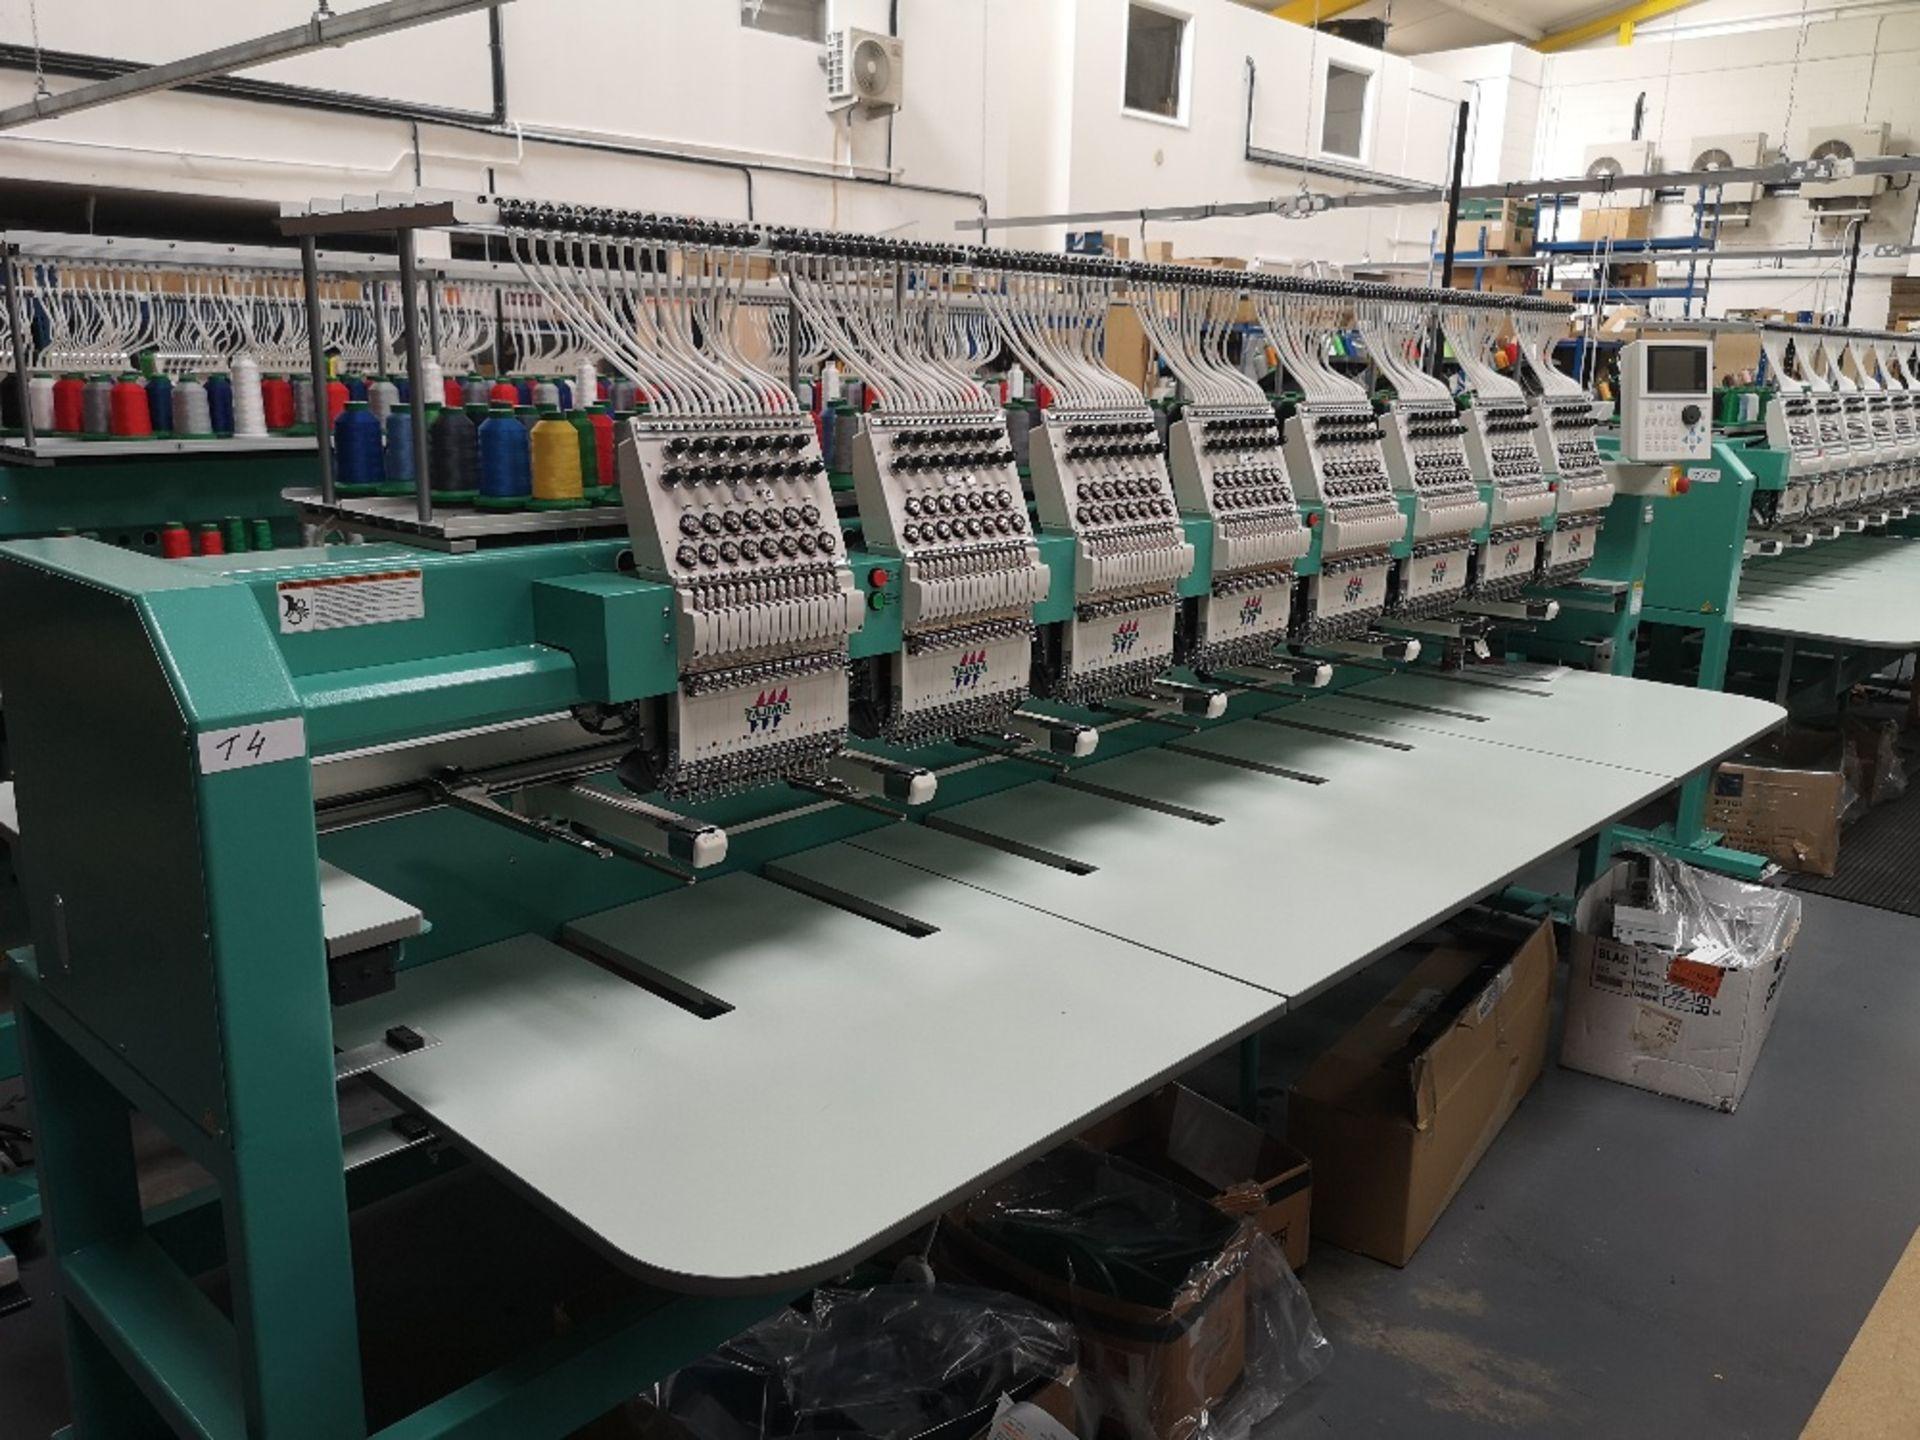 Tajima TFMX-II C1508 Electronic Multi Head Automatic Embroidery Machine (2017) - Image 2 of 12